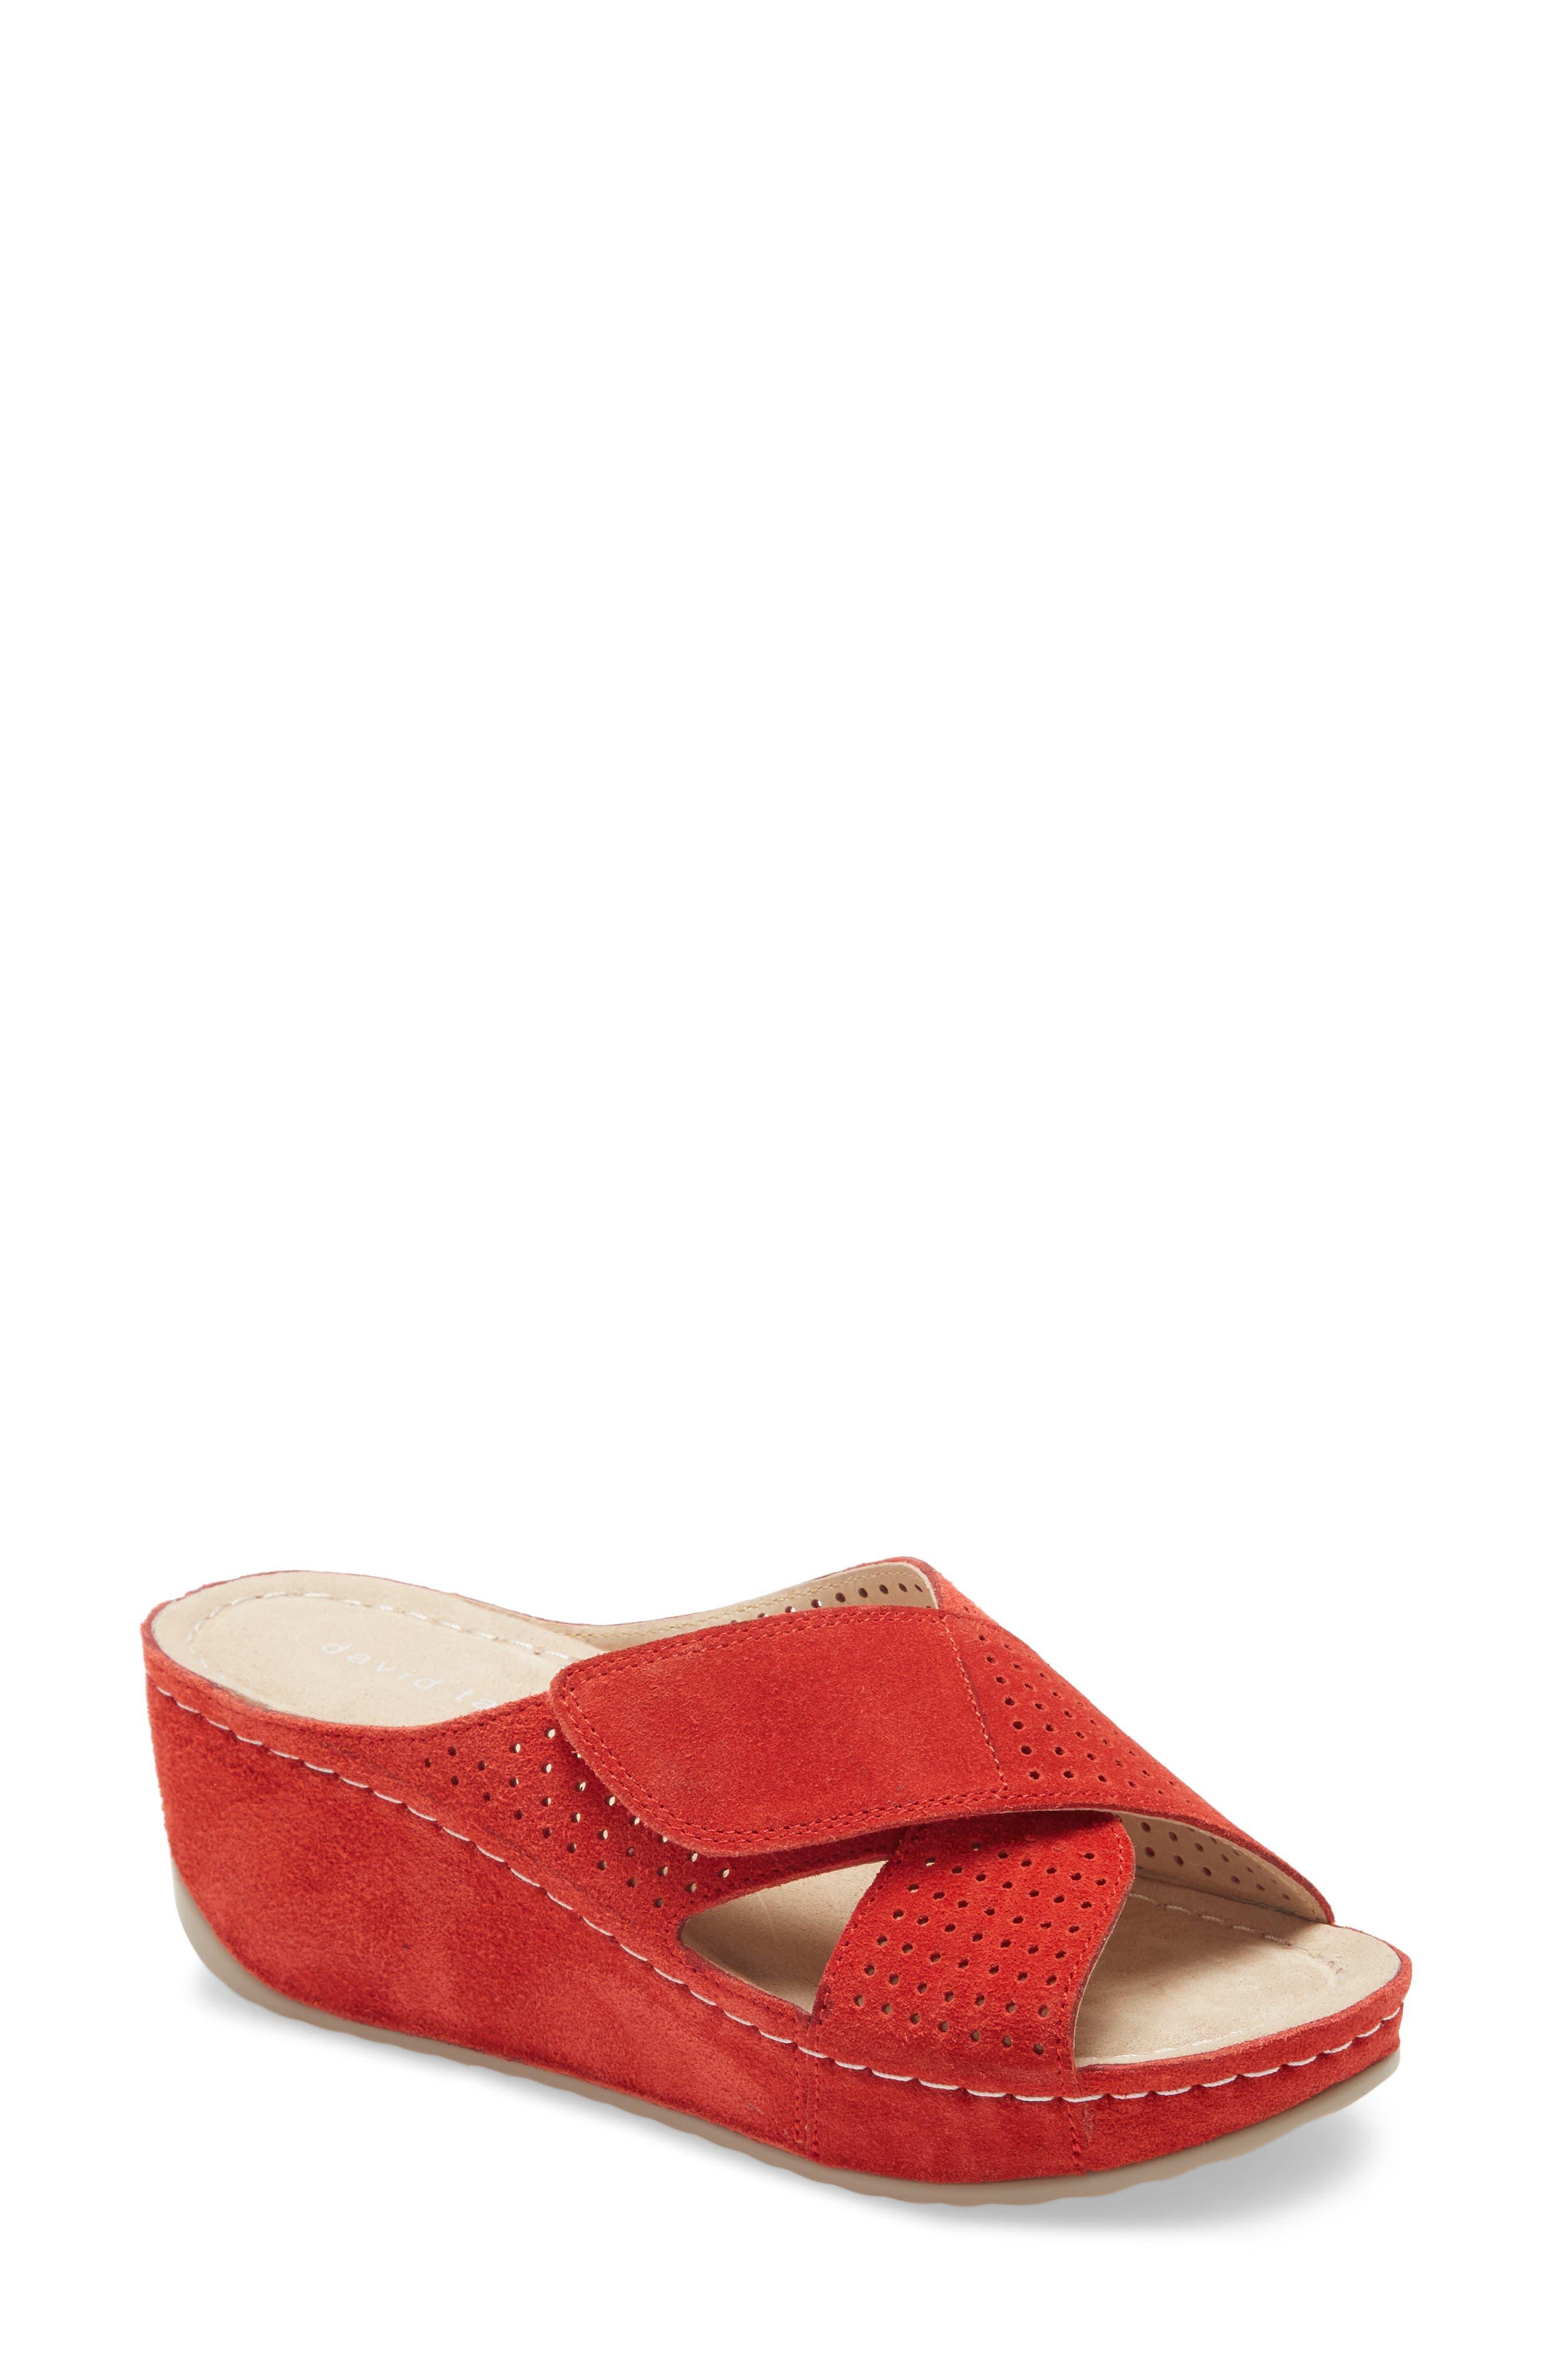 Iconic Wedge Sandal